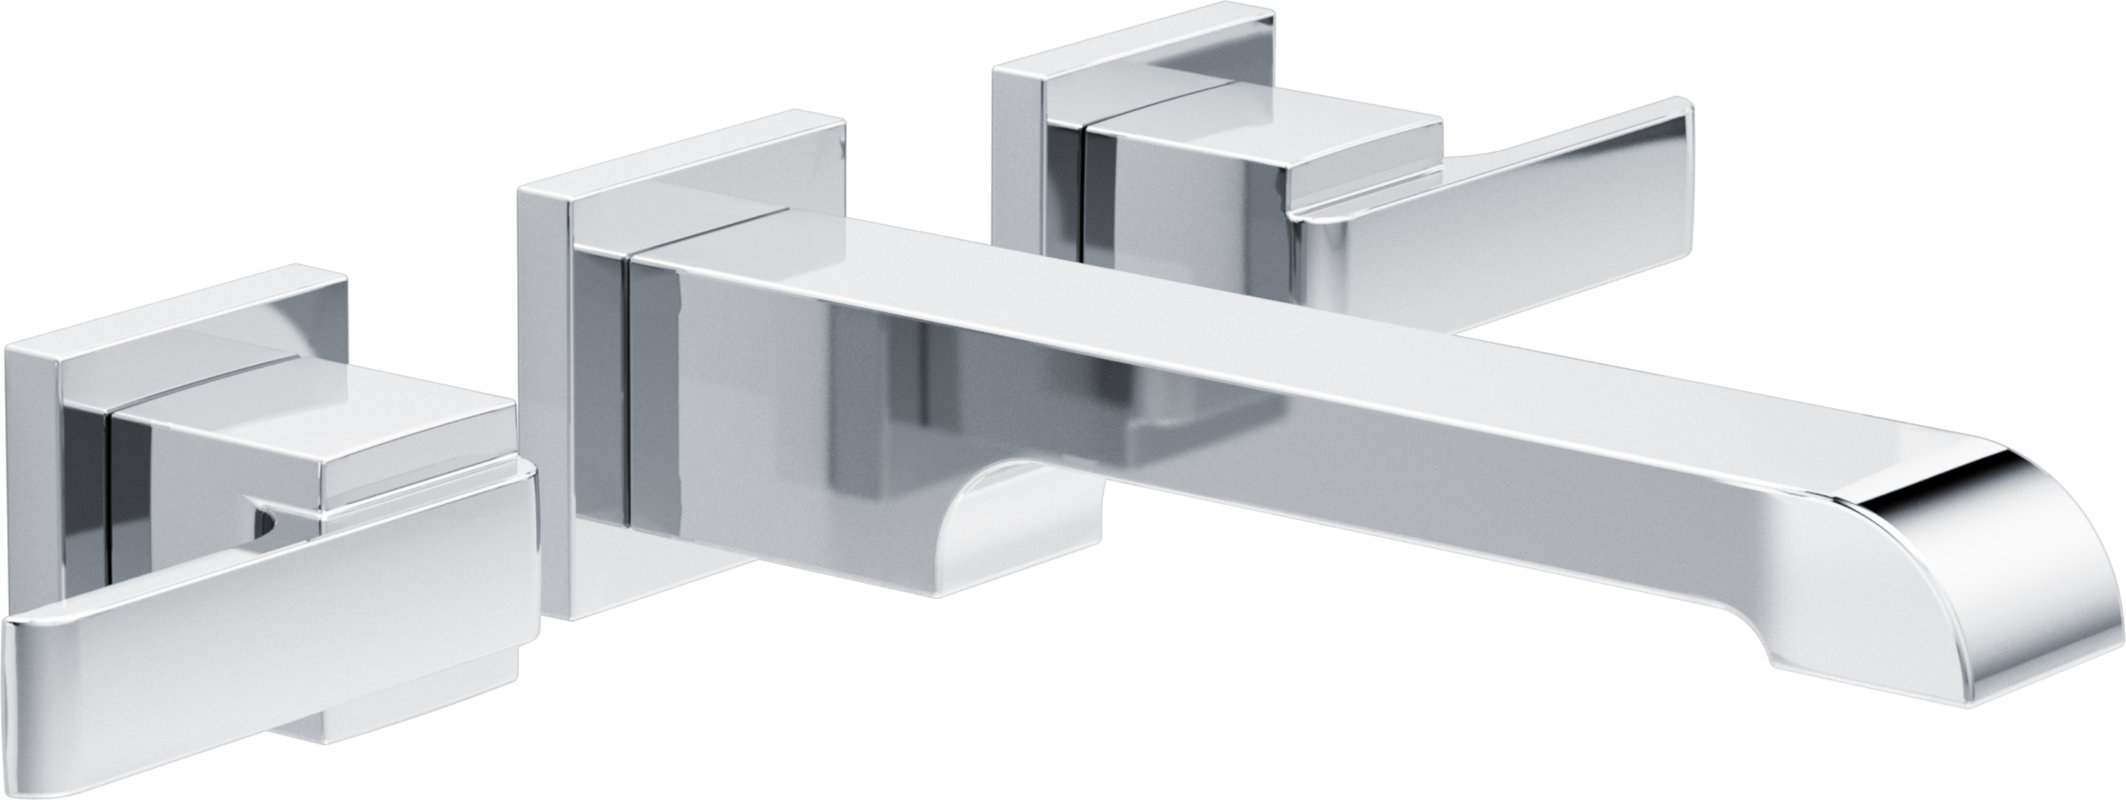 Ideas, delta ara two handle wall mount lavatory faucet reviews wayfair throughout measurements 2126 x 800  .